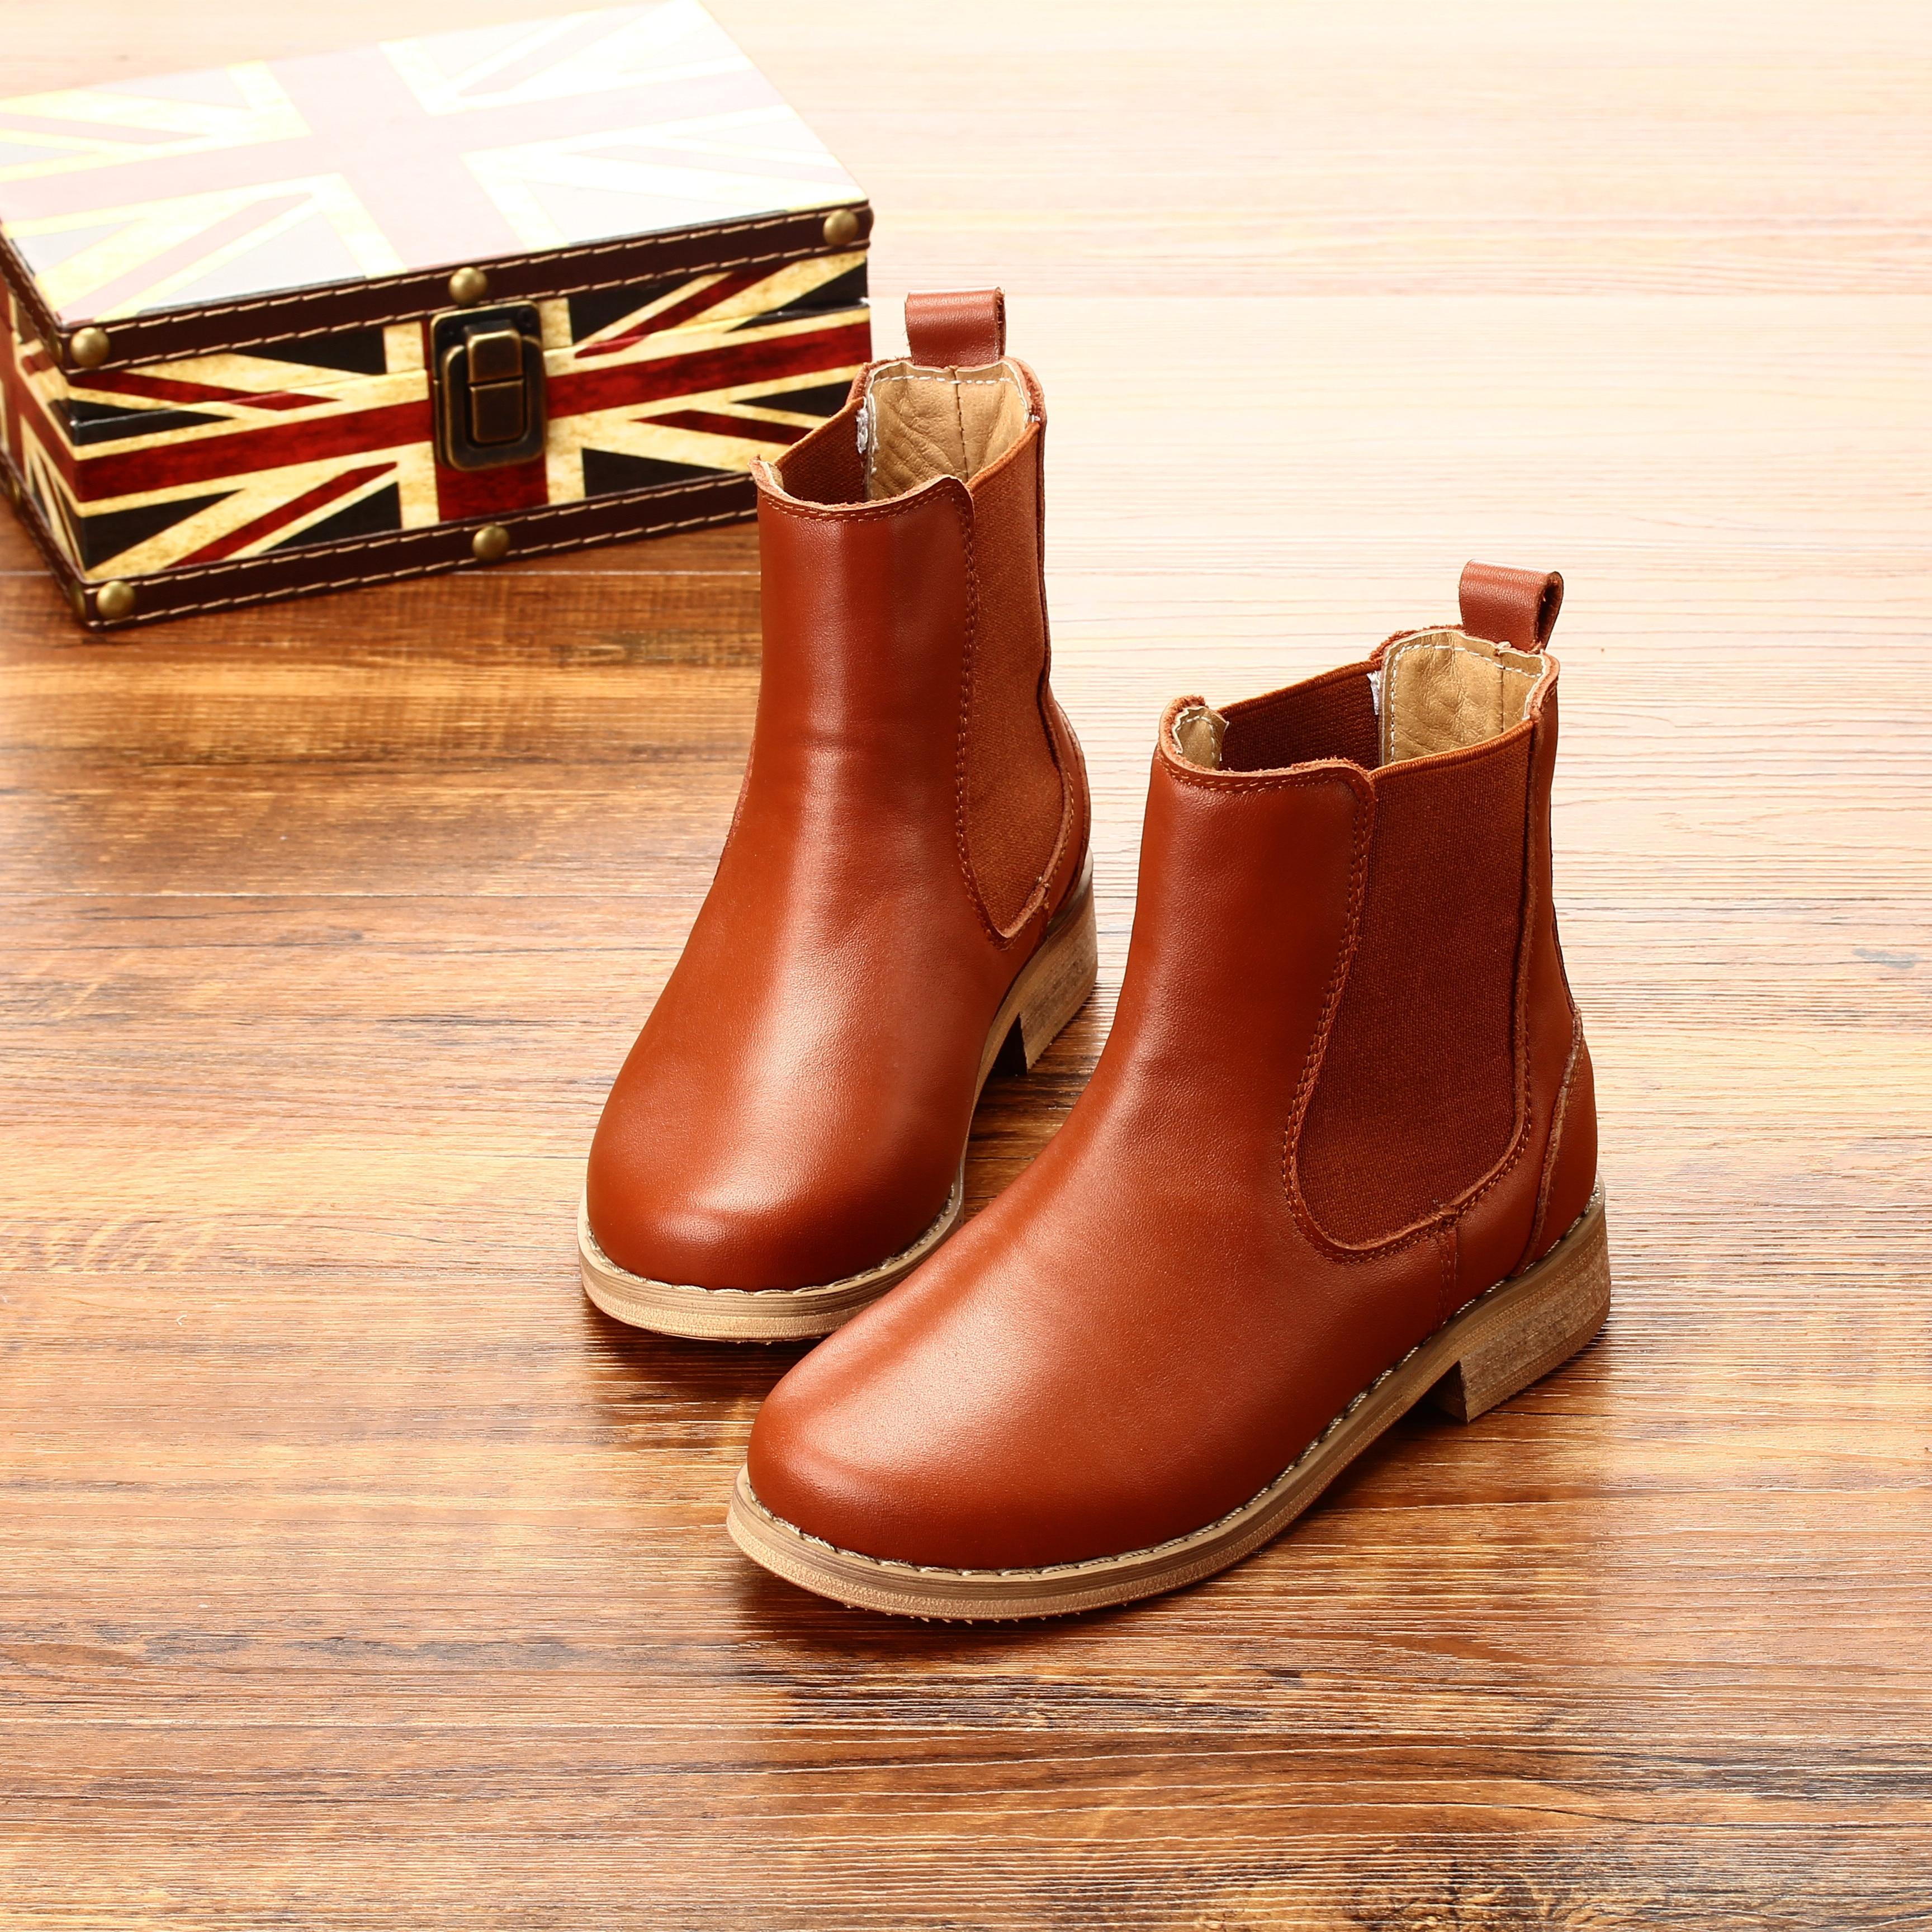 Koovan Children Boots 2017 Girls Cow Leather Single  Winter Autumn Childrens Shoe Girls Short Boots Boys Martin shoes<br>